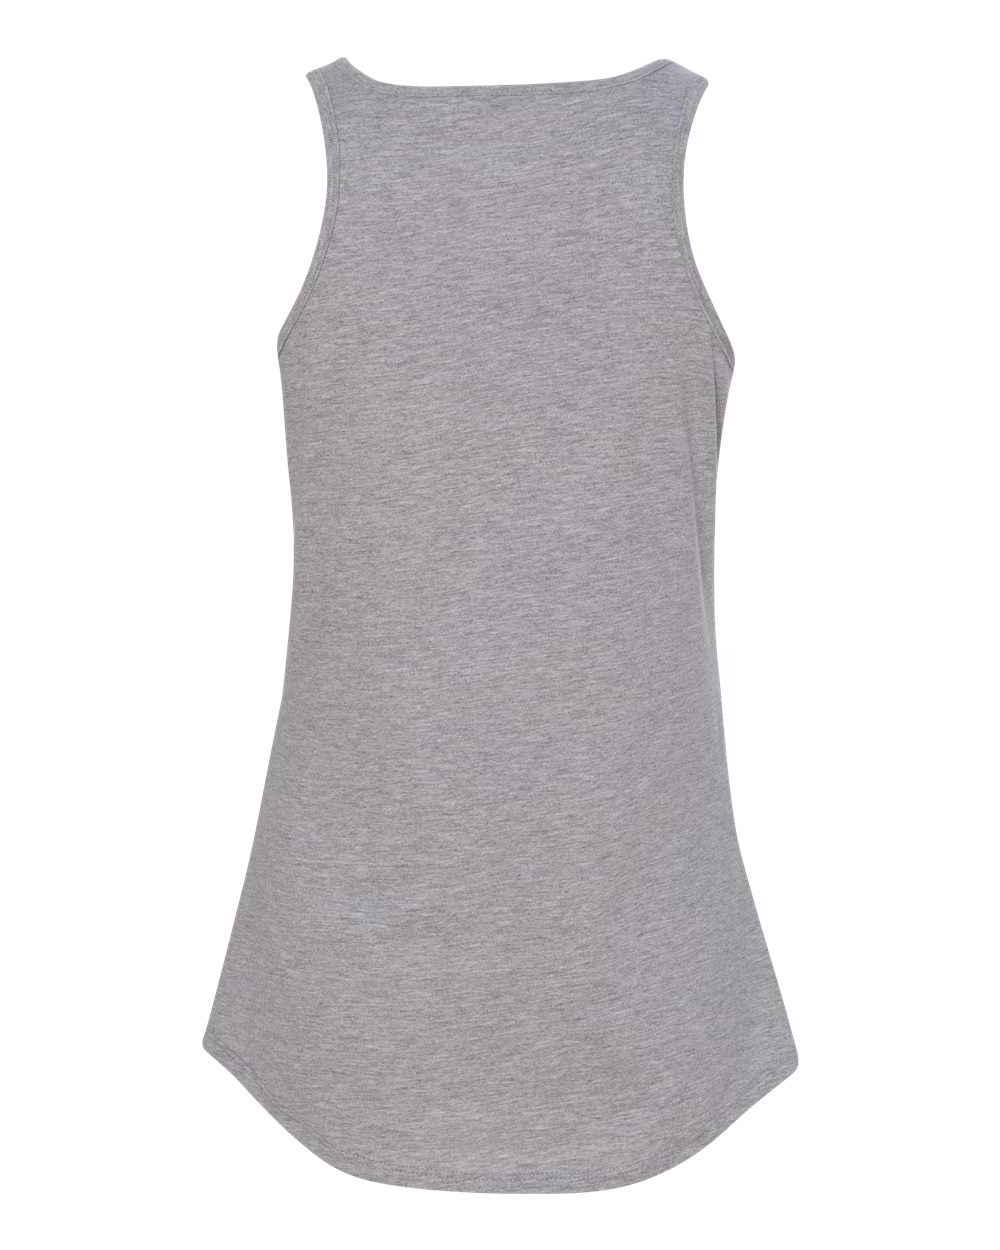 Hanes-Ladies-Moisture-Wicking-Shirts-Sleeveless-X-Temp-Women-039-s-Tank-Top thumbnail 12